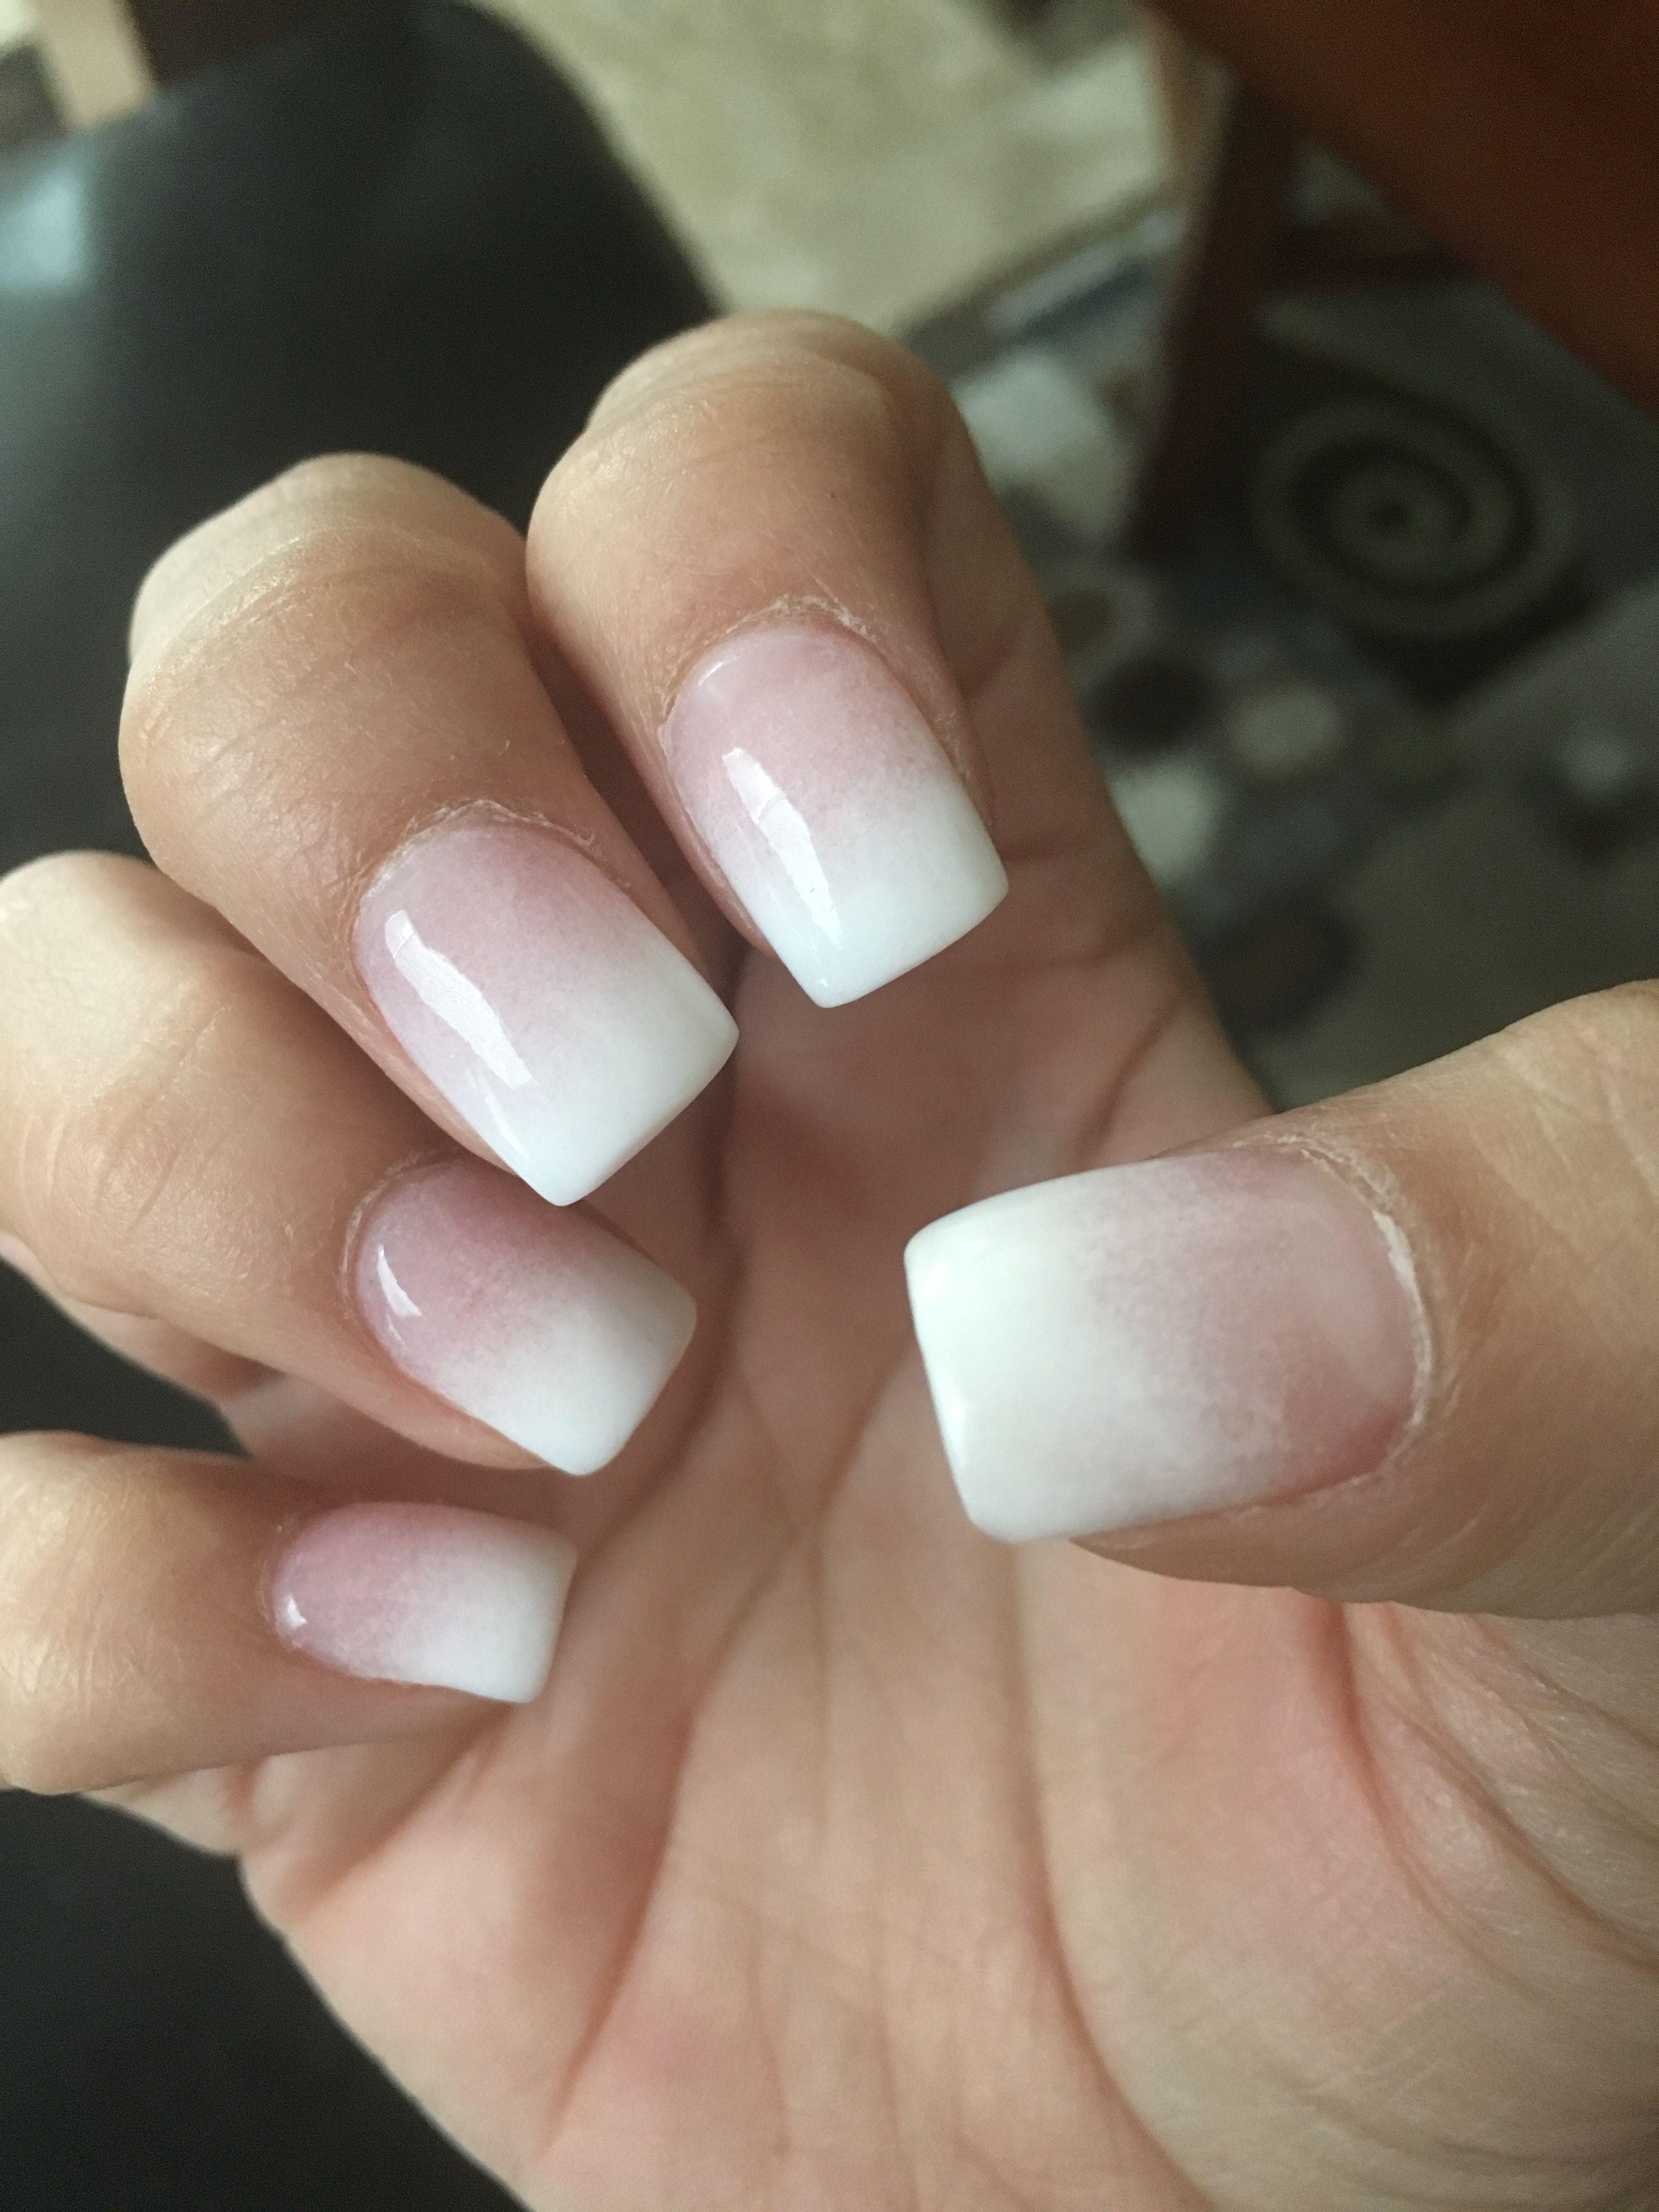 Pink And White Ombre Nexgen Nails Nexgen Nails Nexgen Nails Colors Pink Ombre Nails